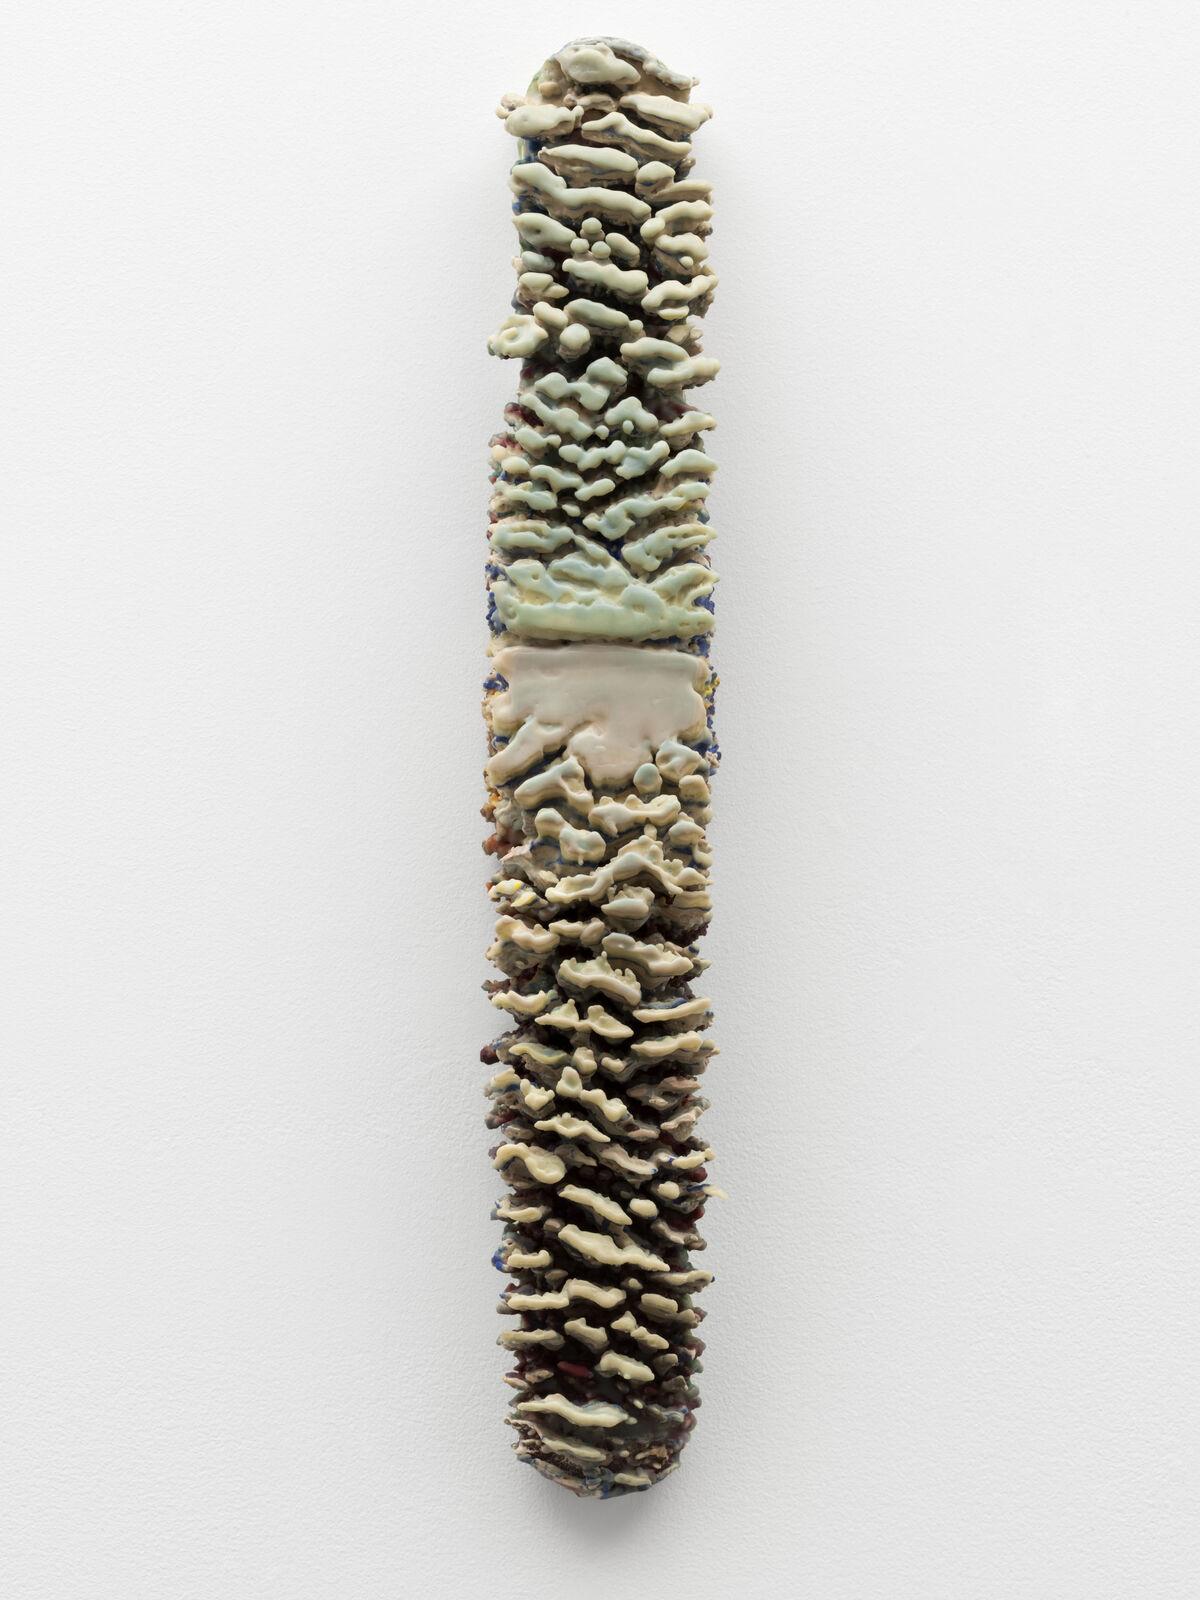 Lynda Benglis, Embryo II, 1967. Courtesy of the Museum of Modern Art, New York.